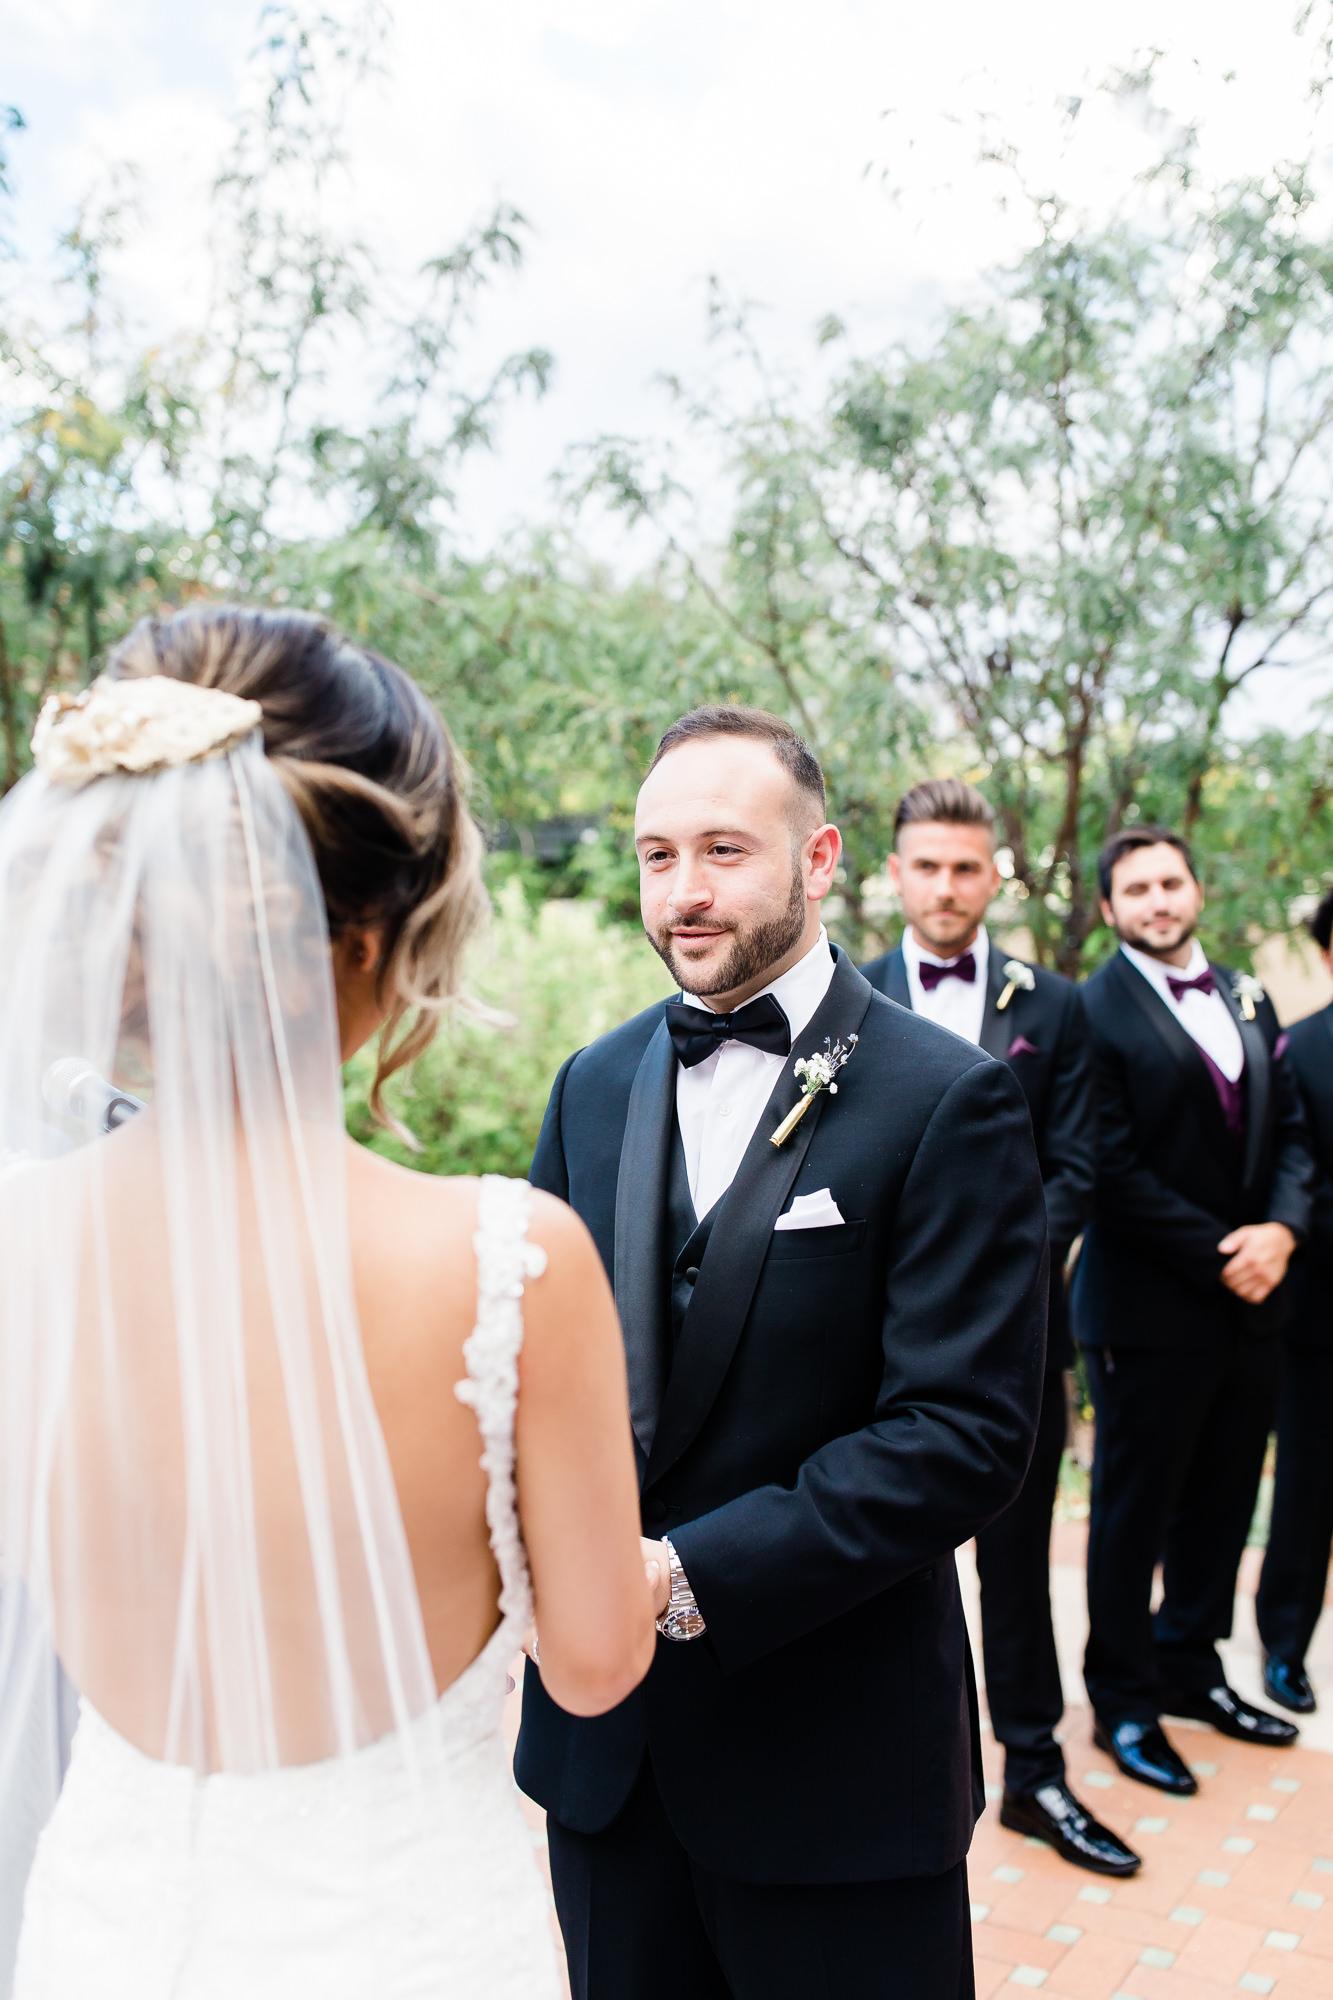 Anthony & Nicole's Wedding_180402.jpg